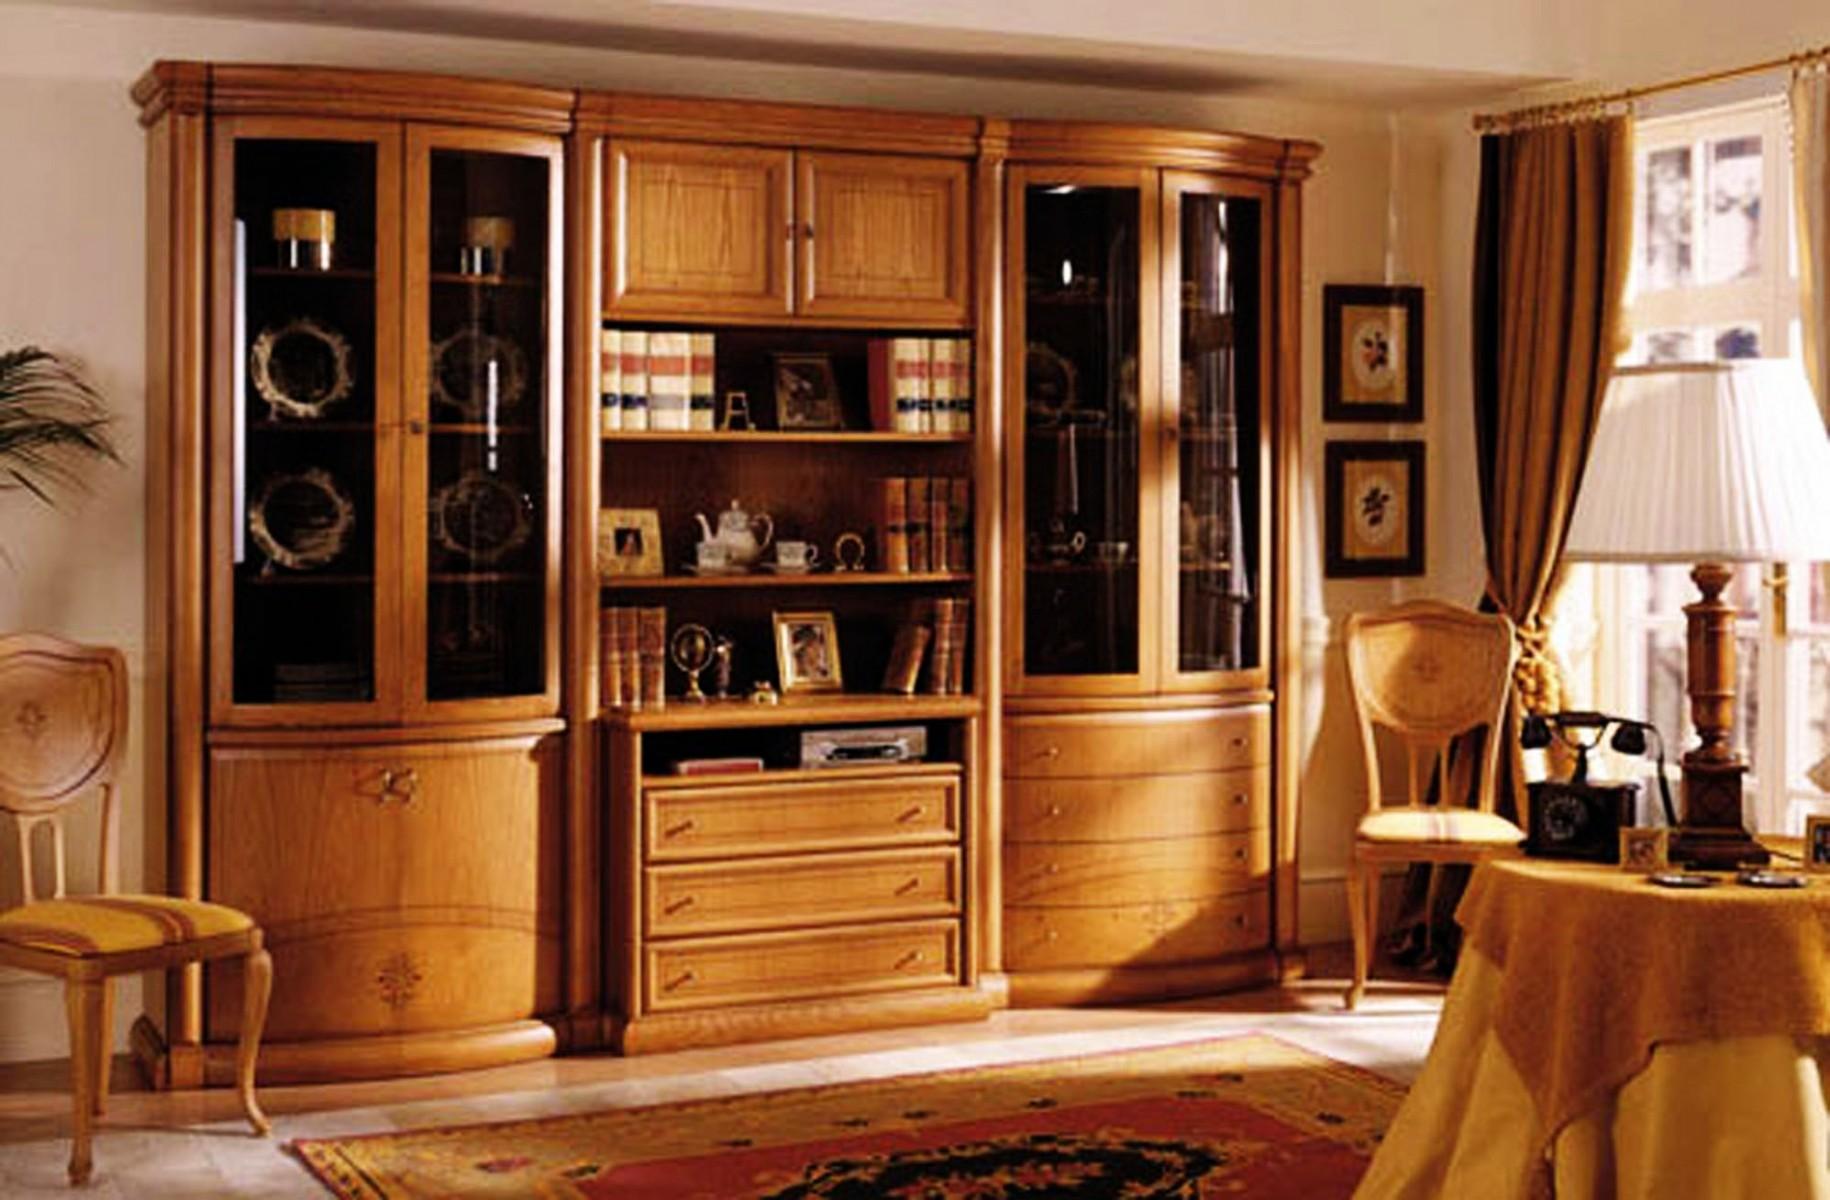 Mueble comedor clasico boisserie 13 07 comedores for Modernizar salon muebles clasicos